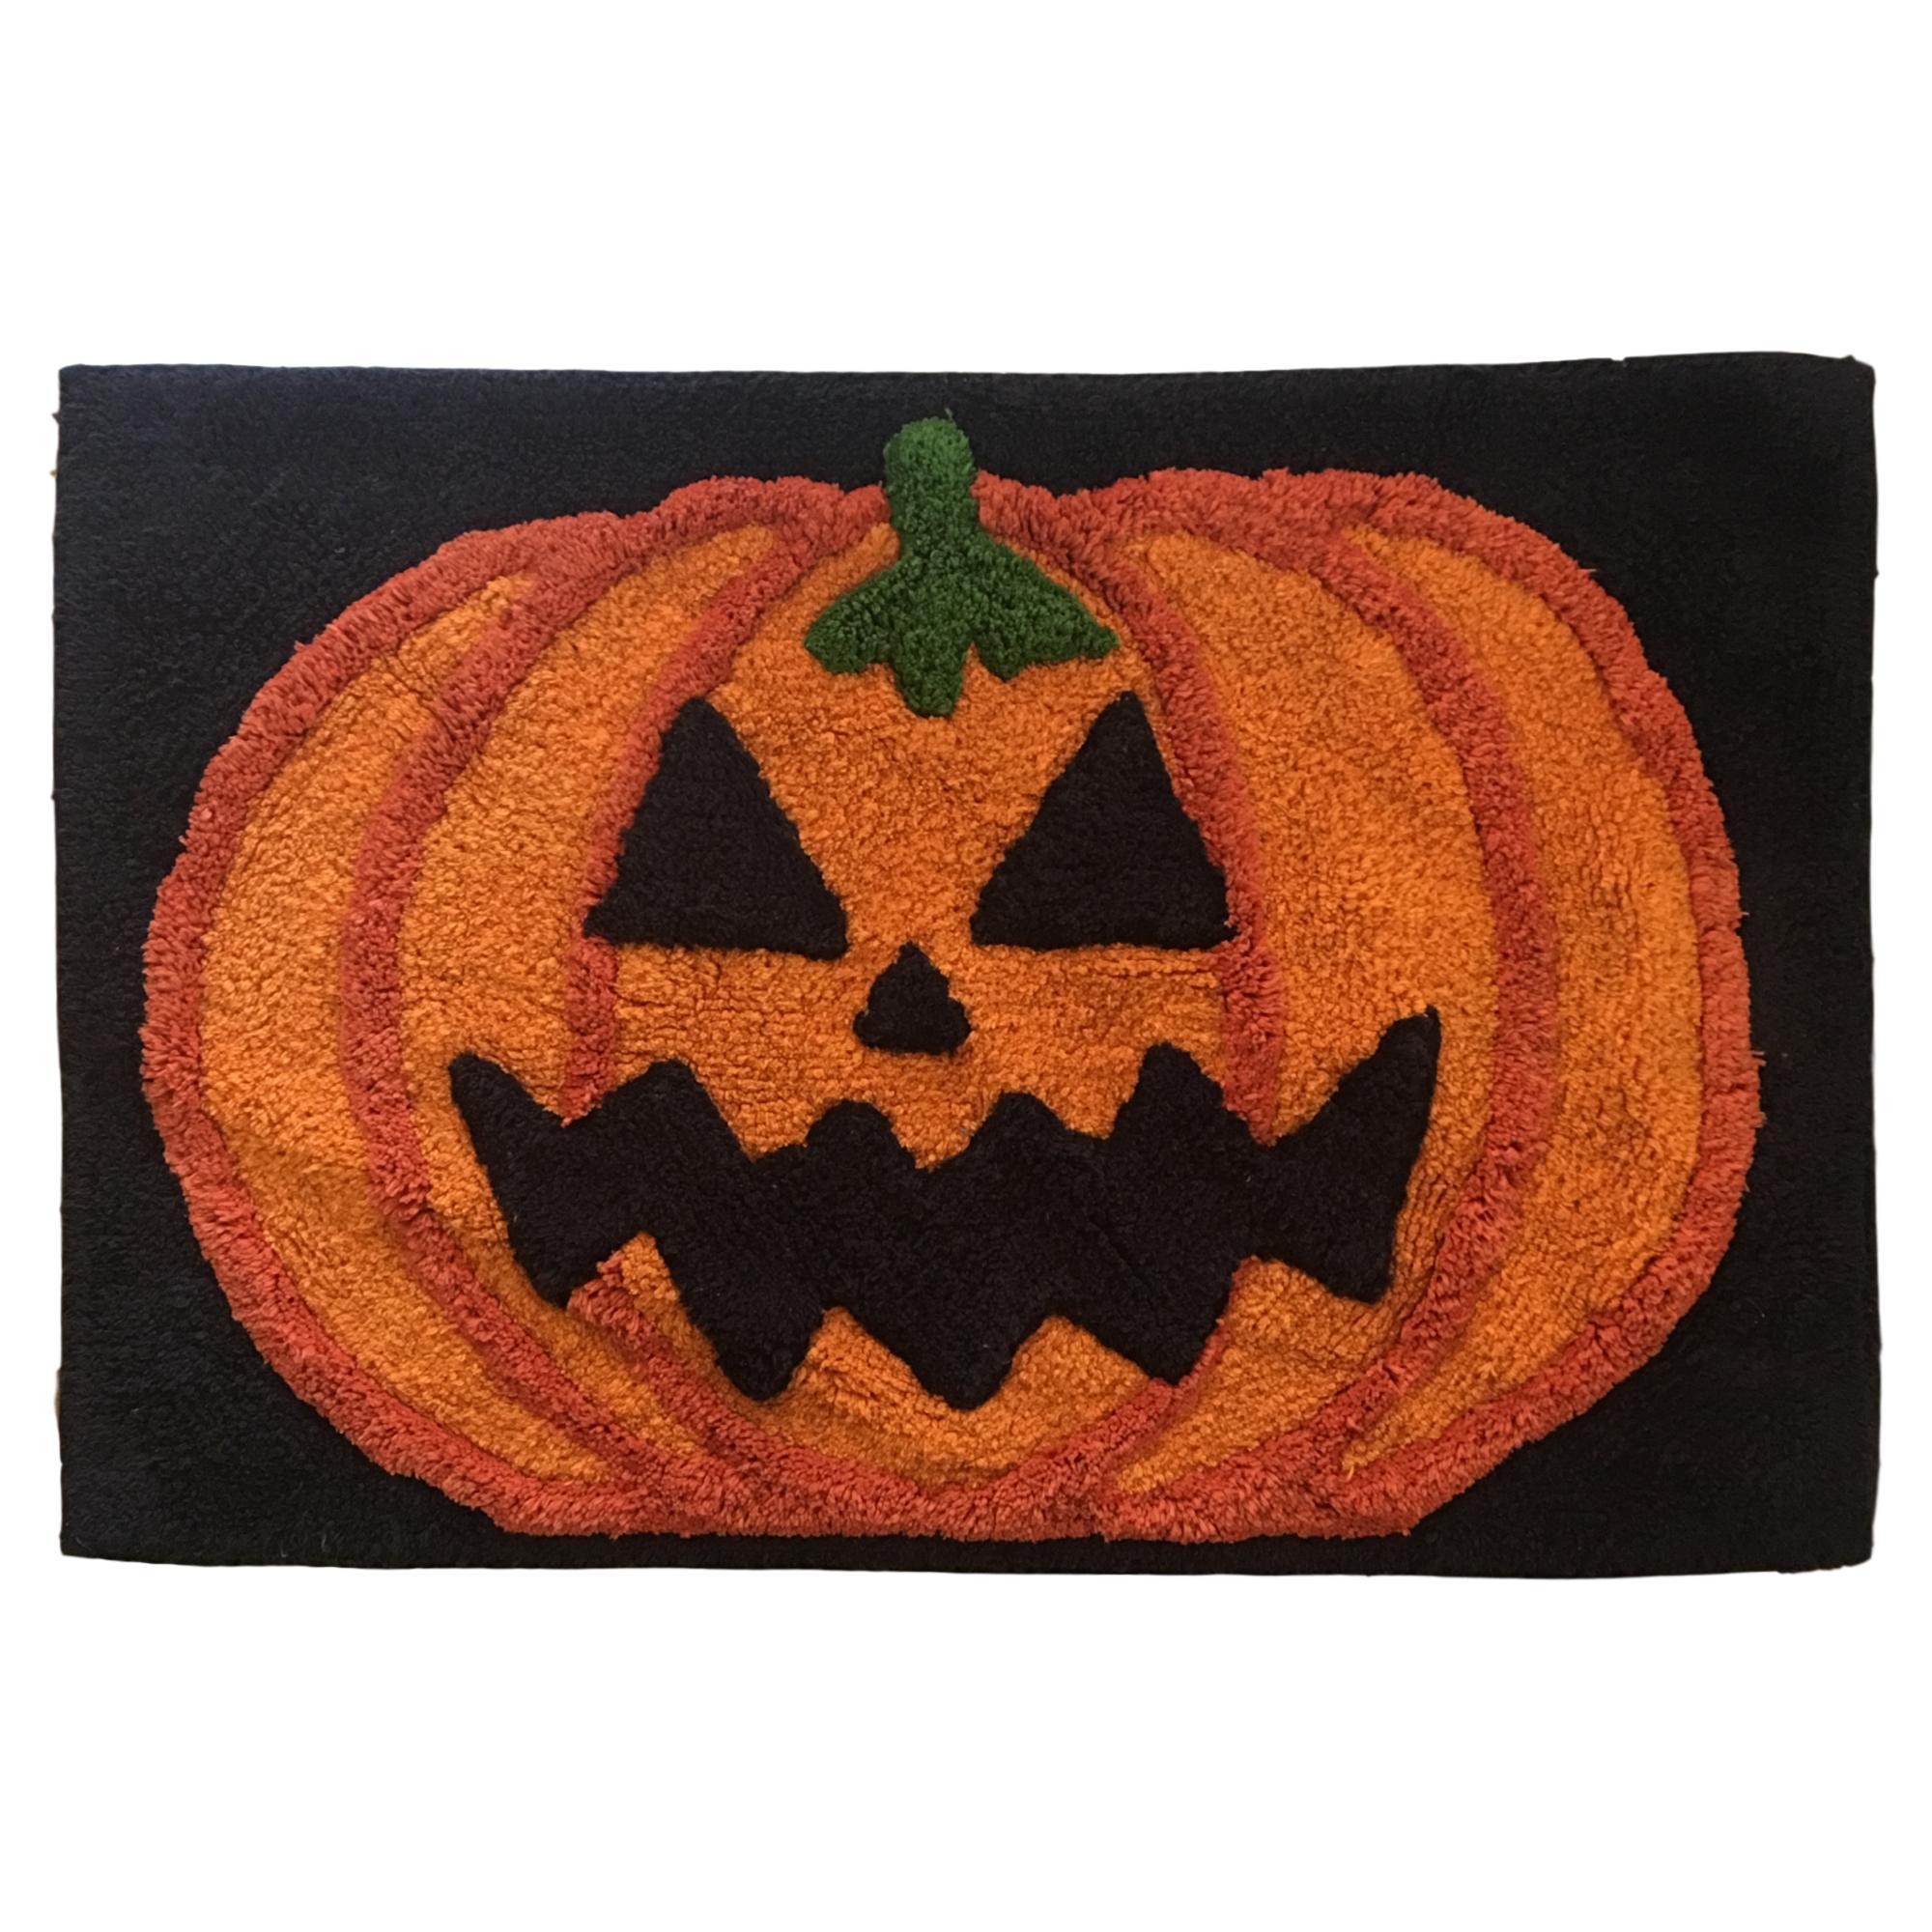 Celebrate Halloween Jack O Lantern Pumpkin Bath Rug 20x30 Accent Mat Walmart Com Walmart Com